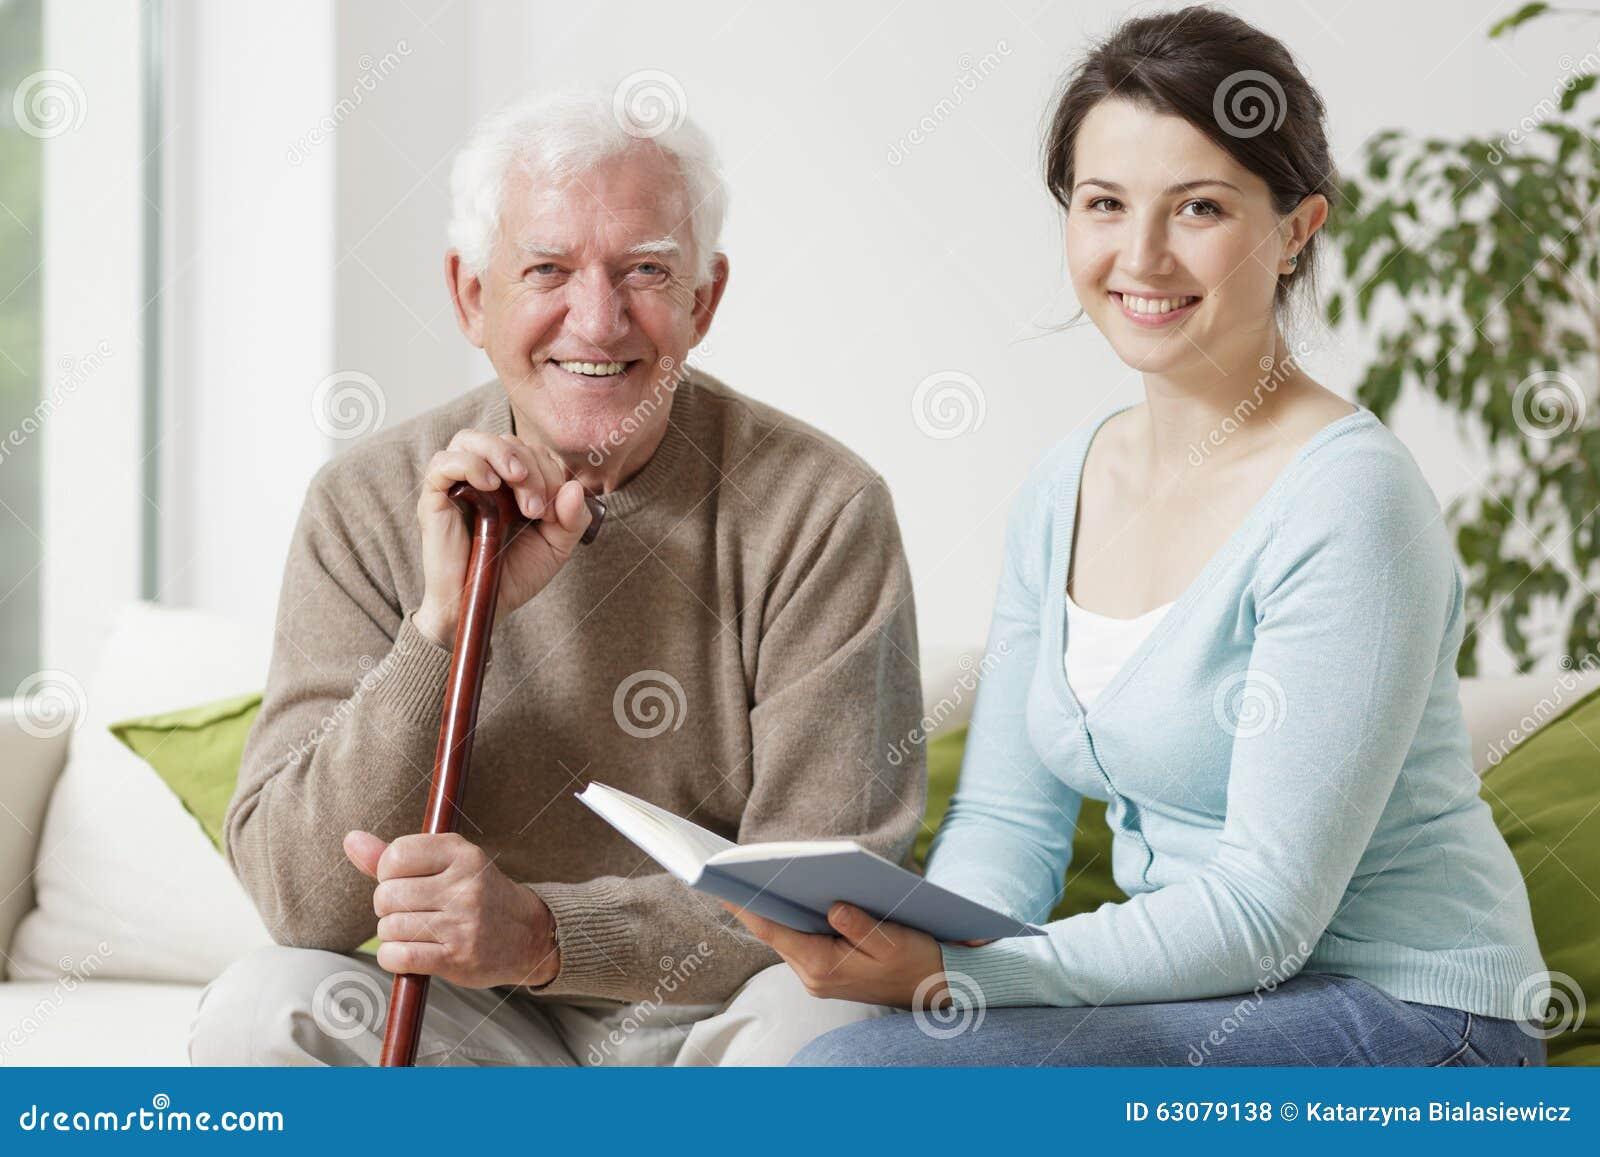 Old men young women